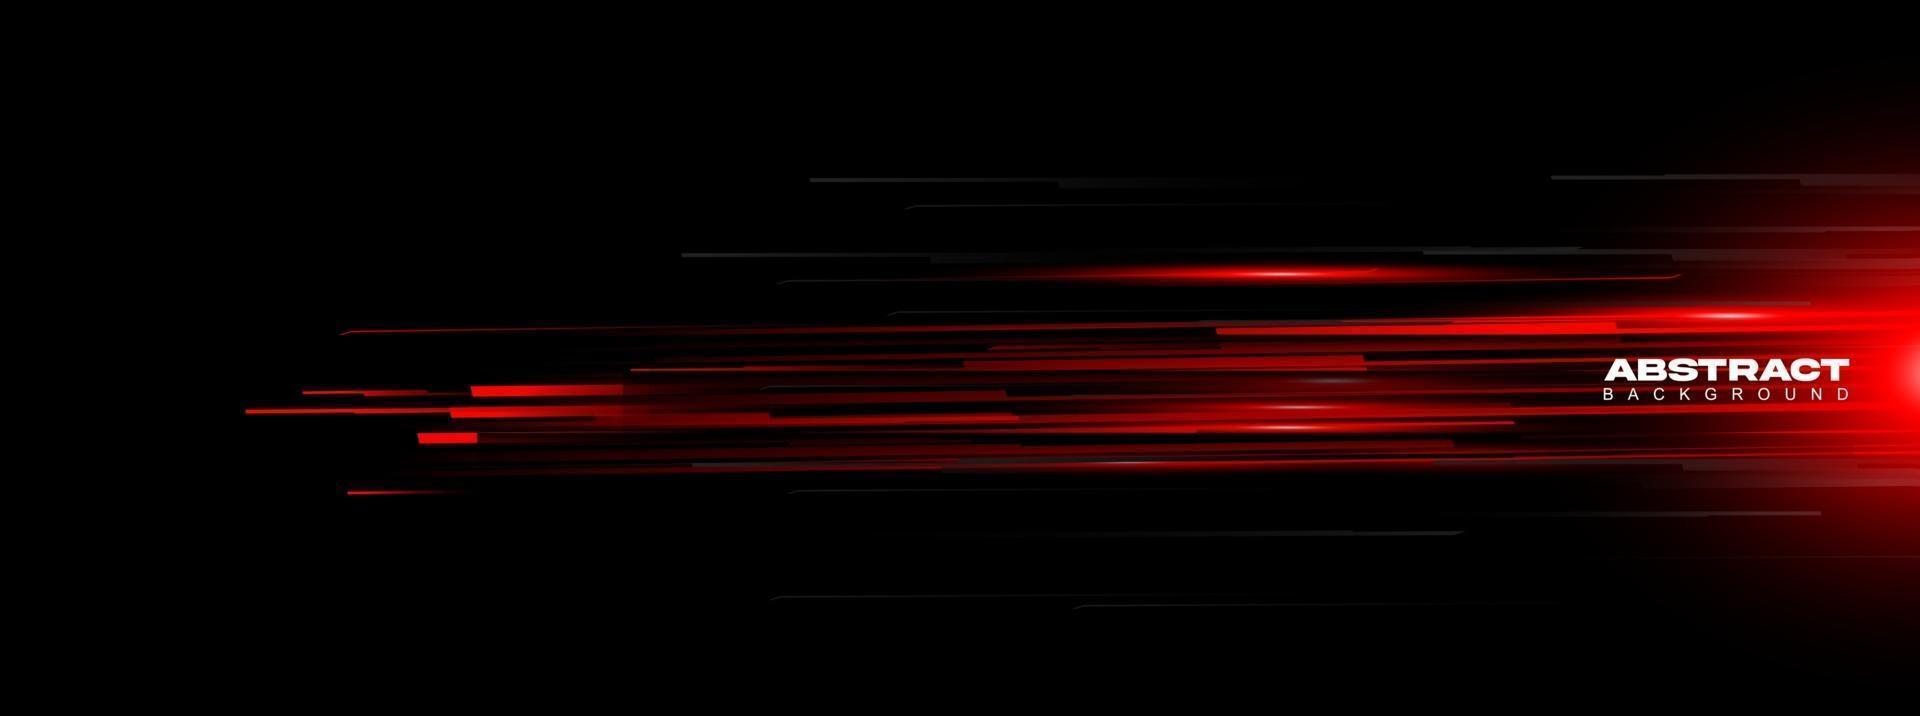 abstrakt grafisk linje rörelse energisk, sportig, teknik, vektorillustration vektor